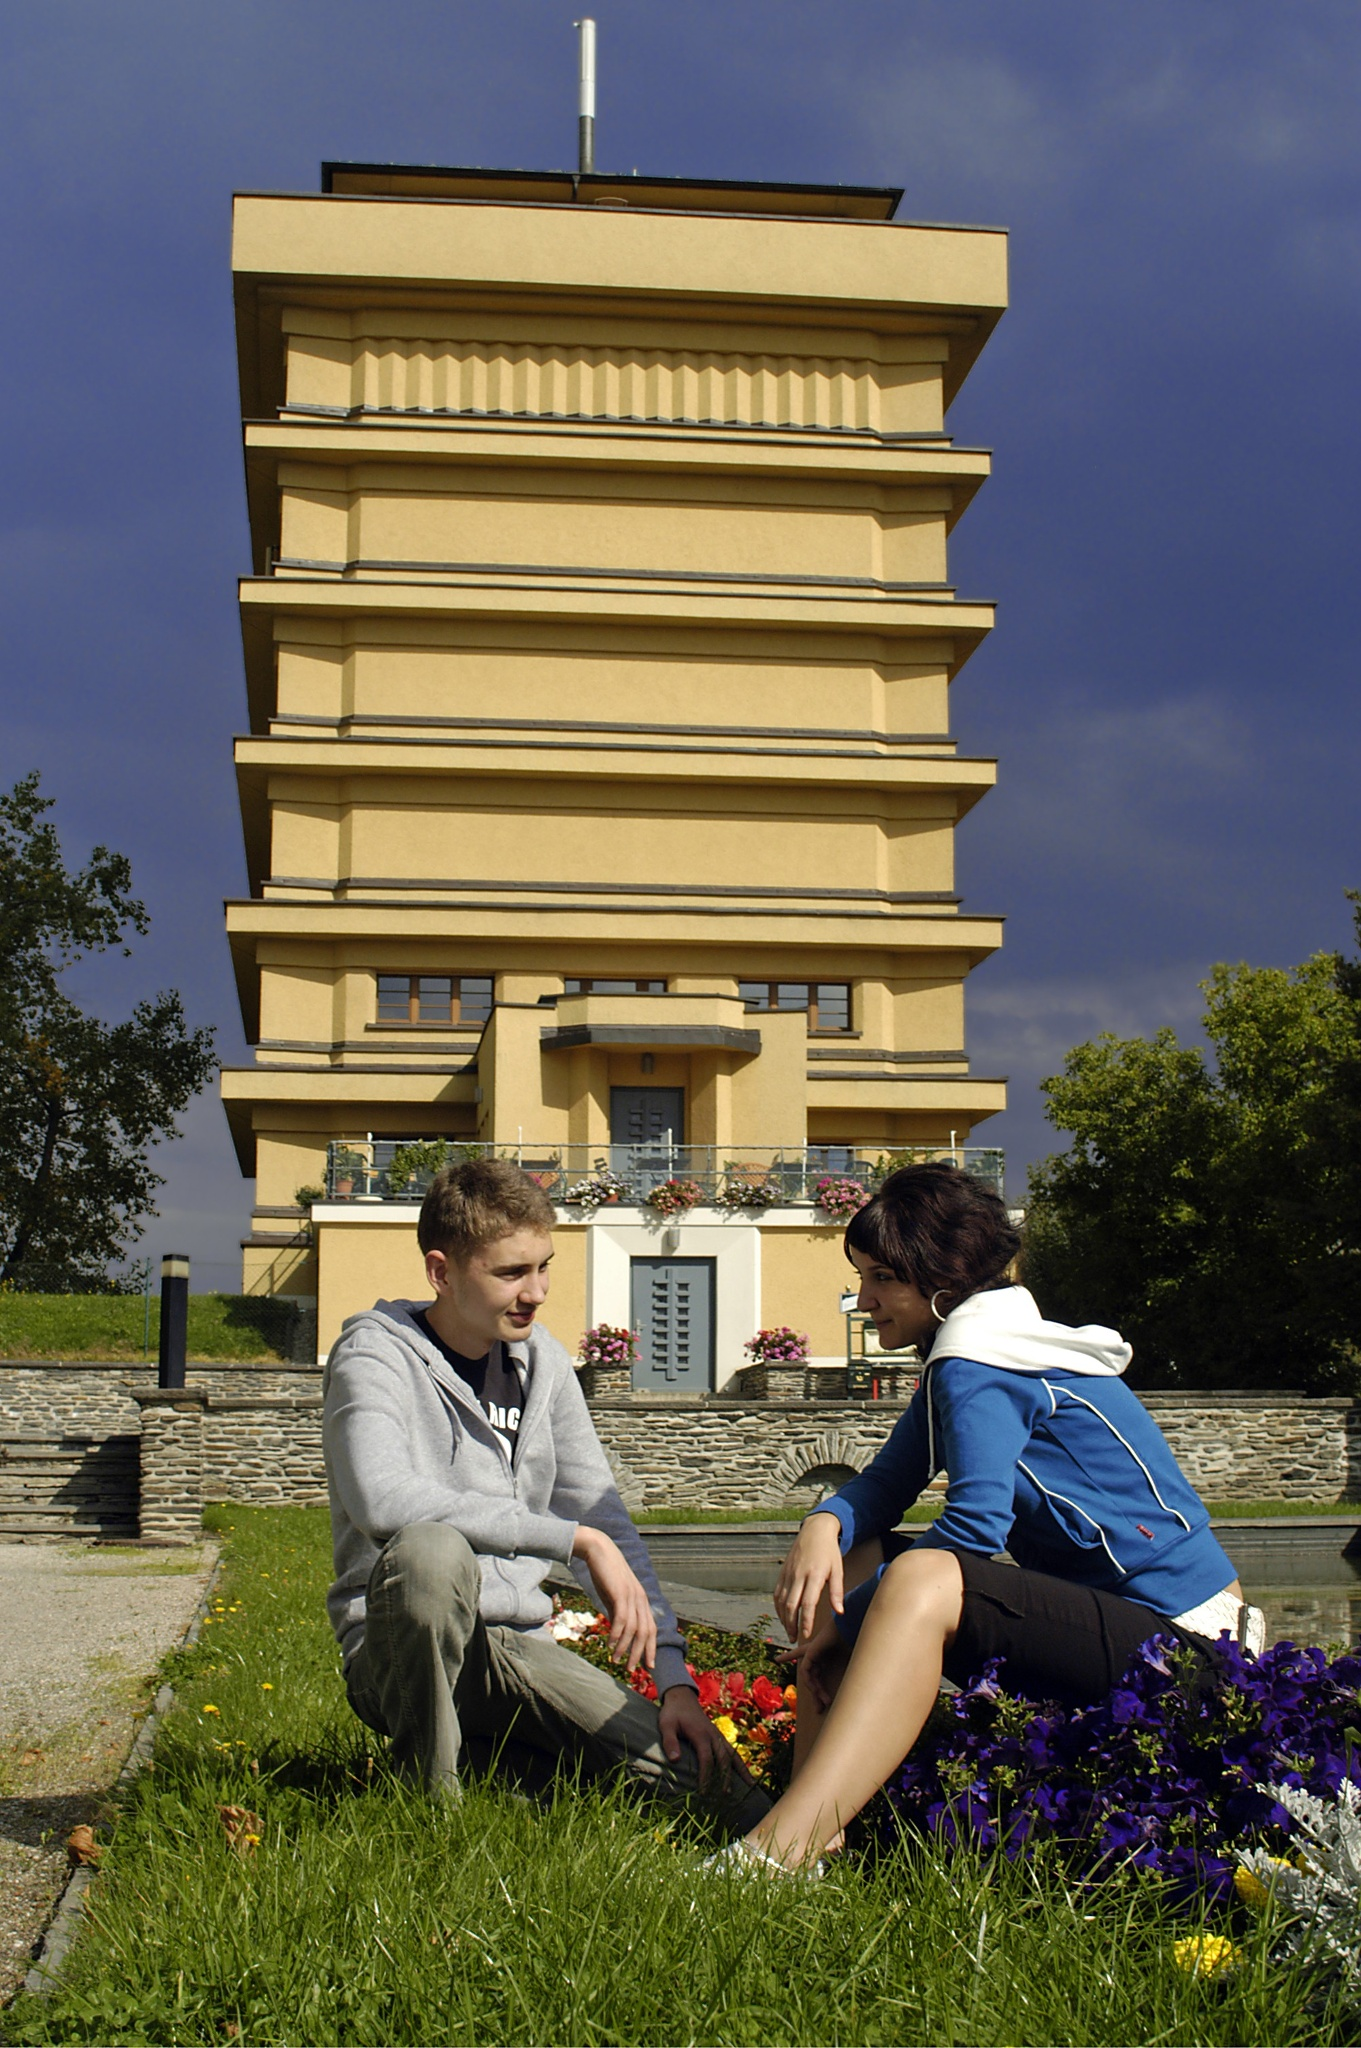 Wasserturm Reichenbach Aussichtsturm Outdooractive Com